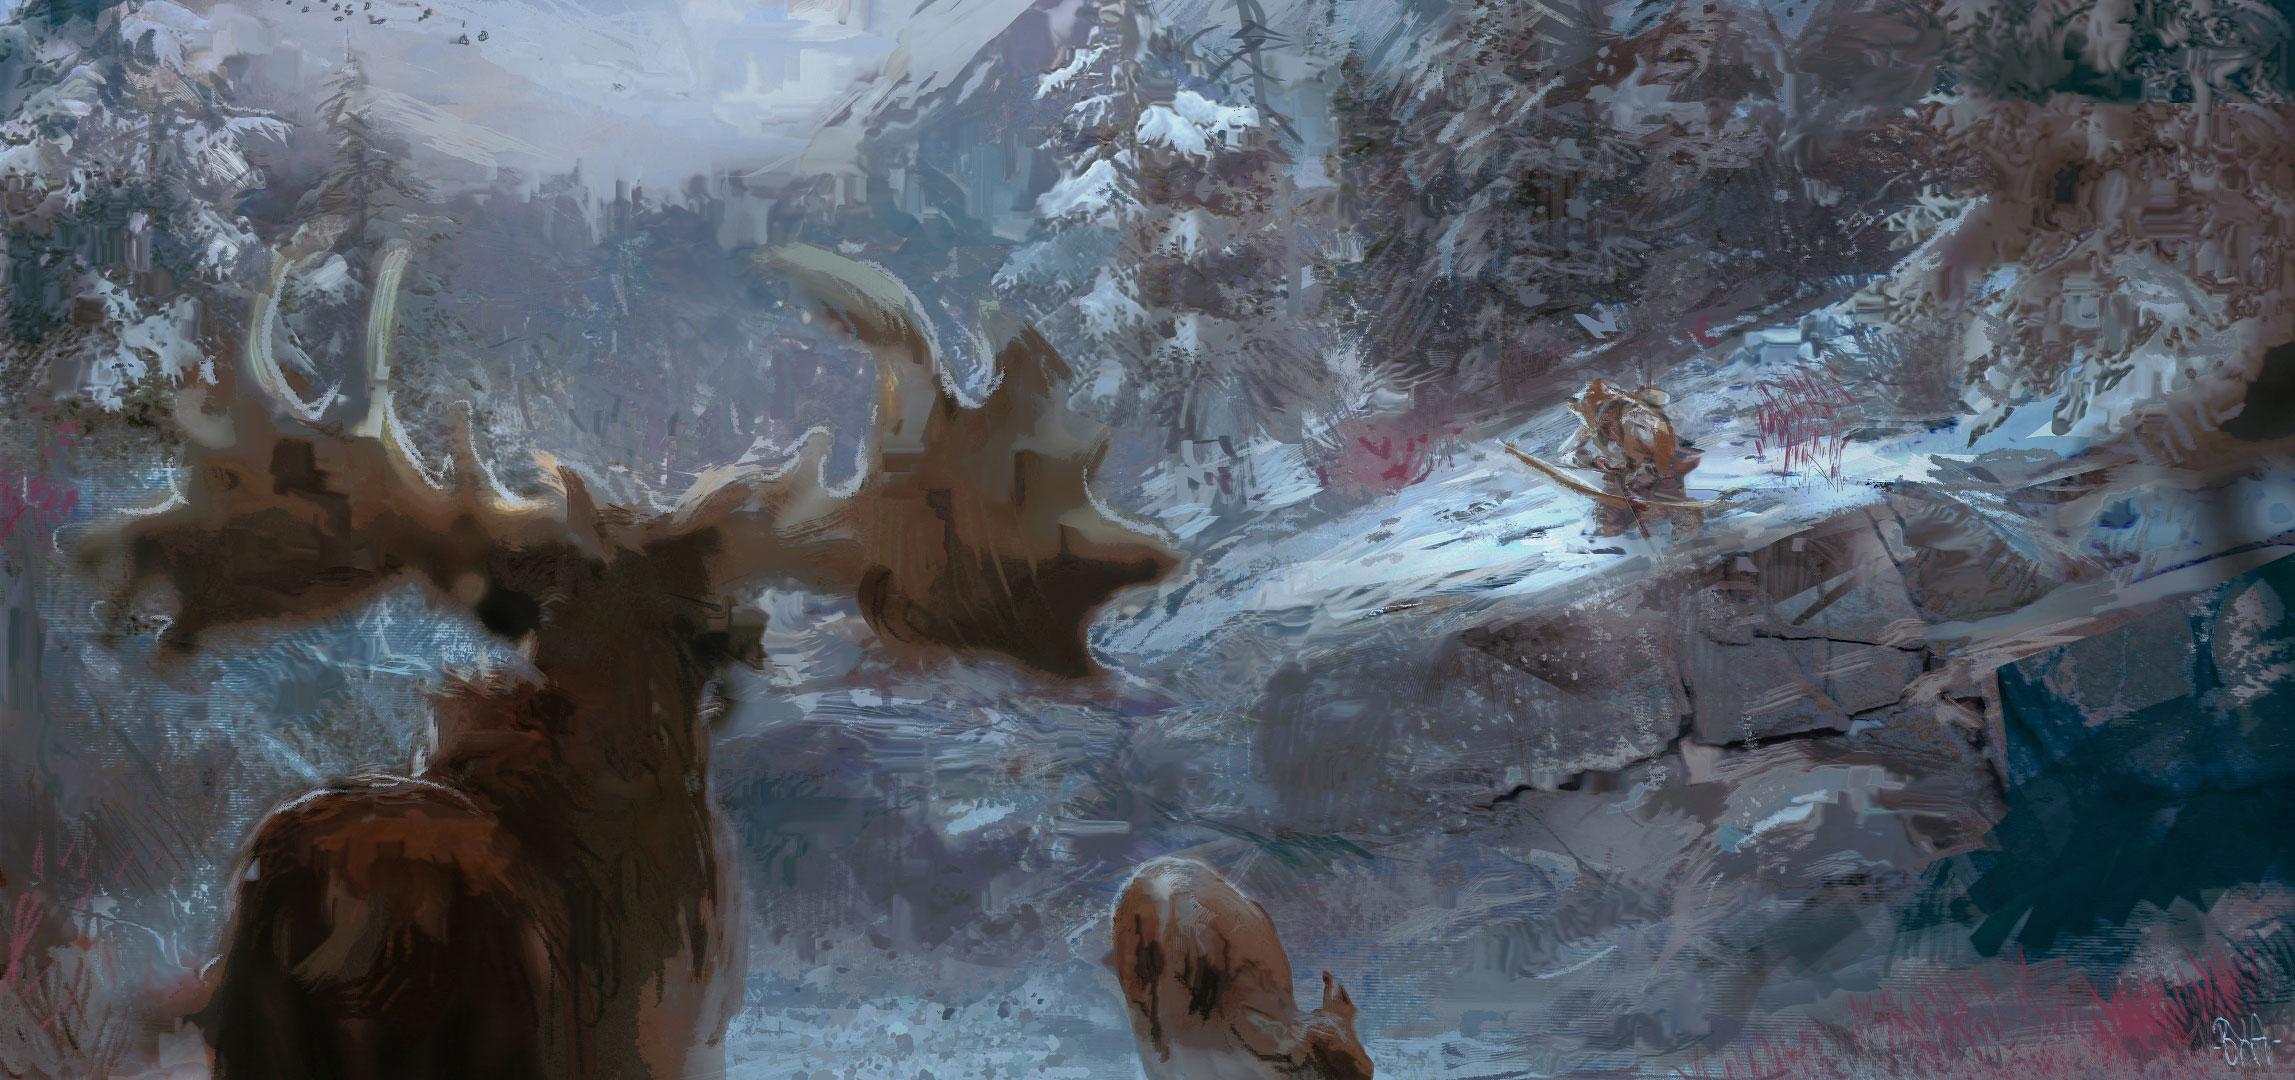 Far Cry Primal bude realističtější. Postará se o to survival mód 121591